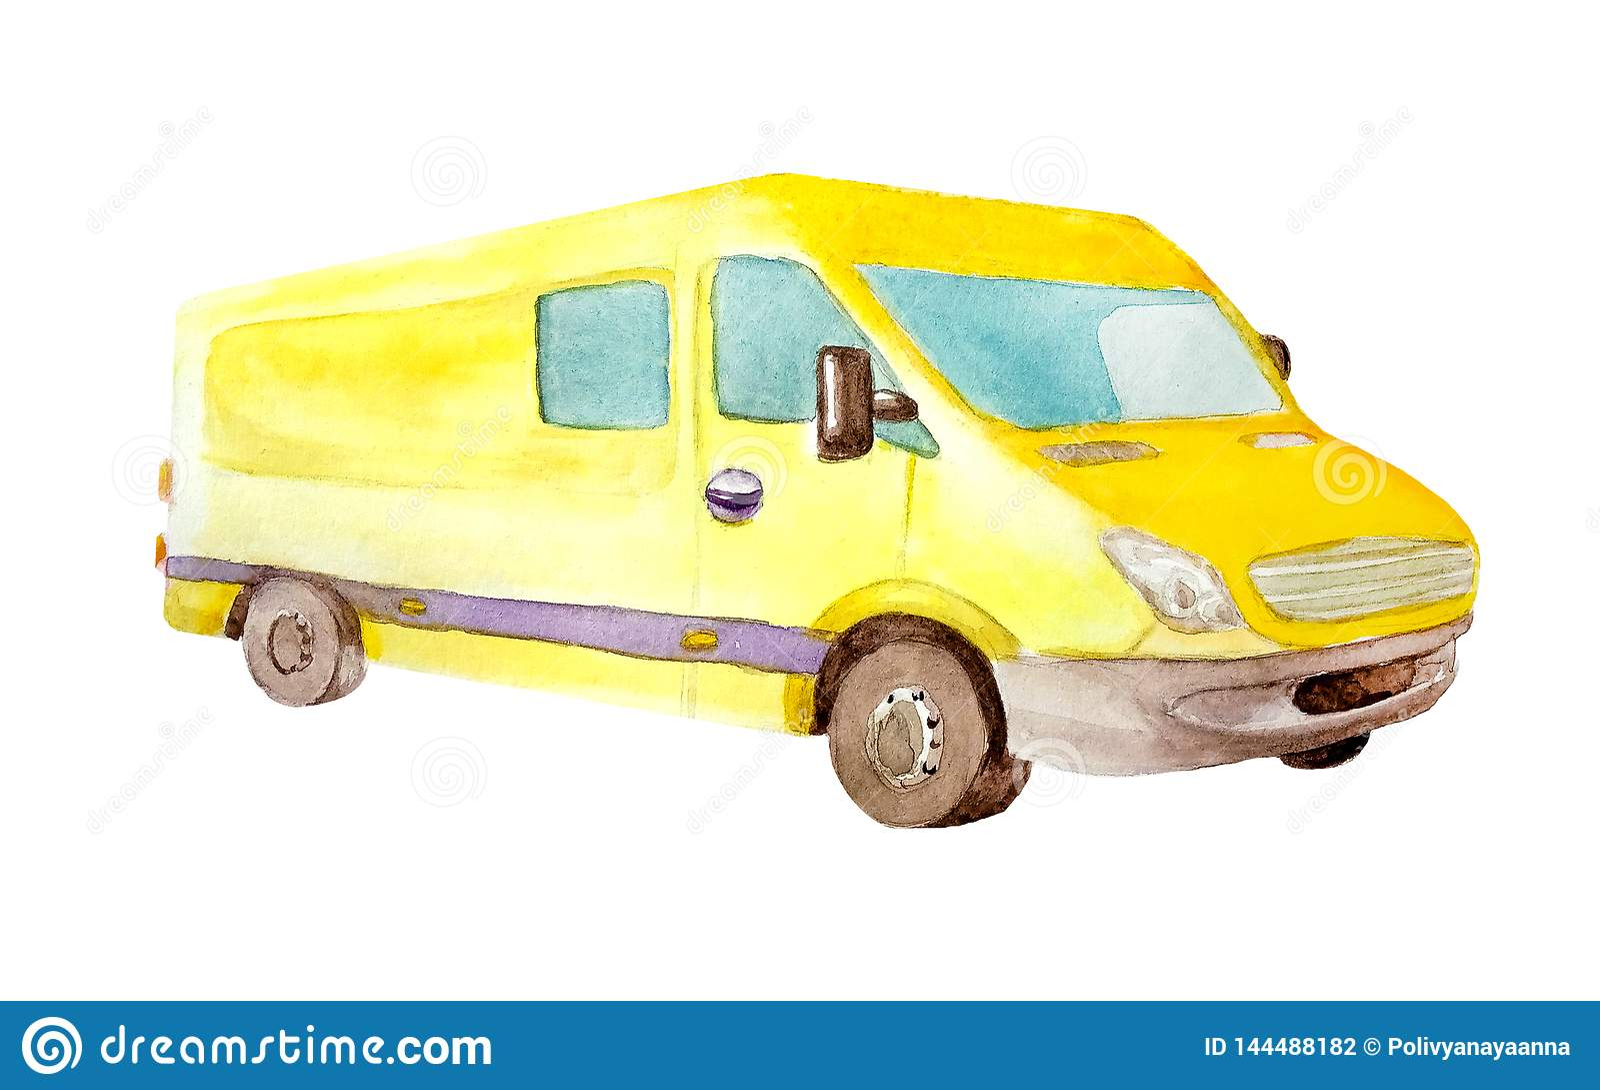 Watercolor κίτρινο van truck με τις γκρίζες ρόδες και ένα παράθυρο στην πλάτη που απομονώνεται στο άσπρο υπόβαθρο για τις κάρτες,